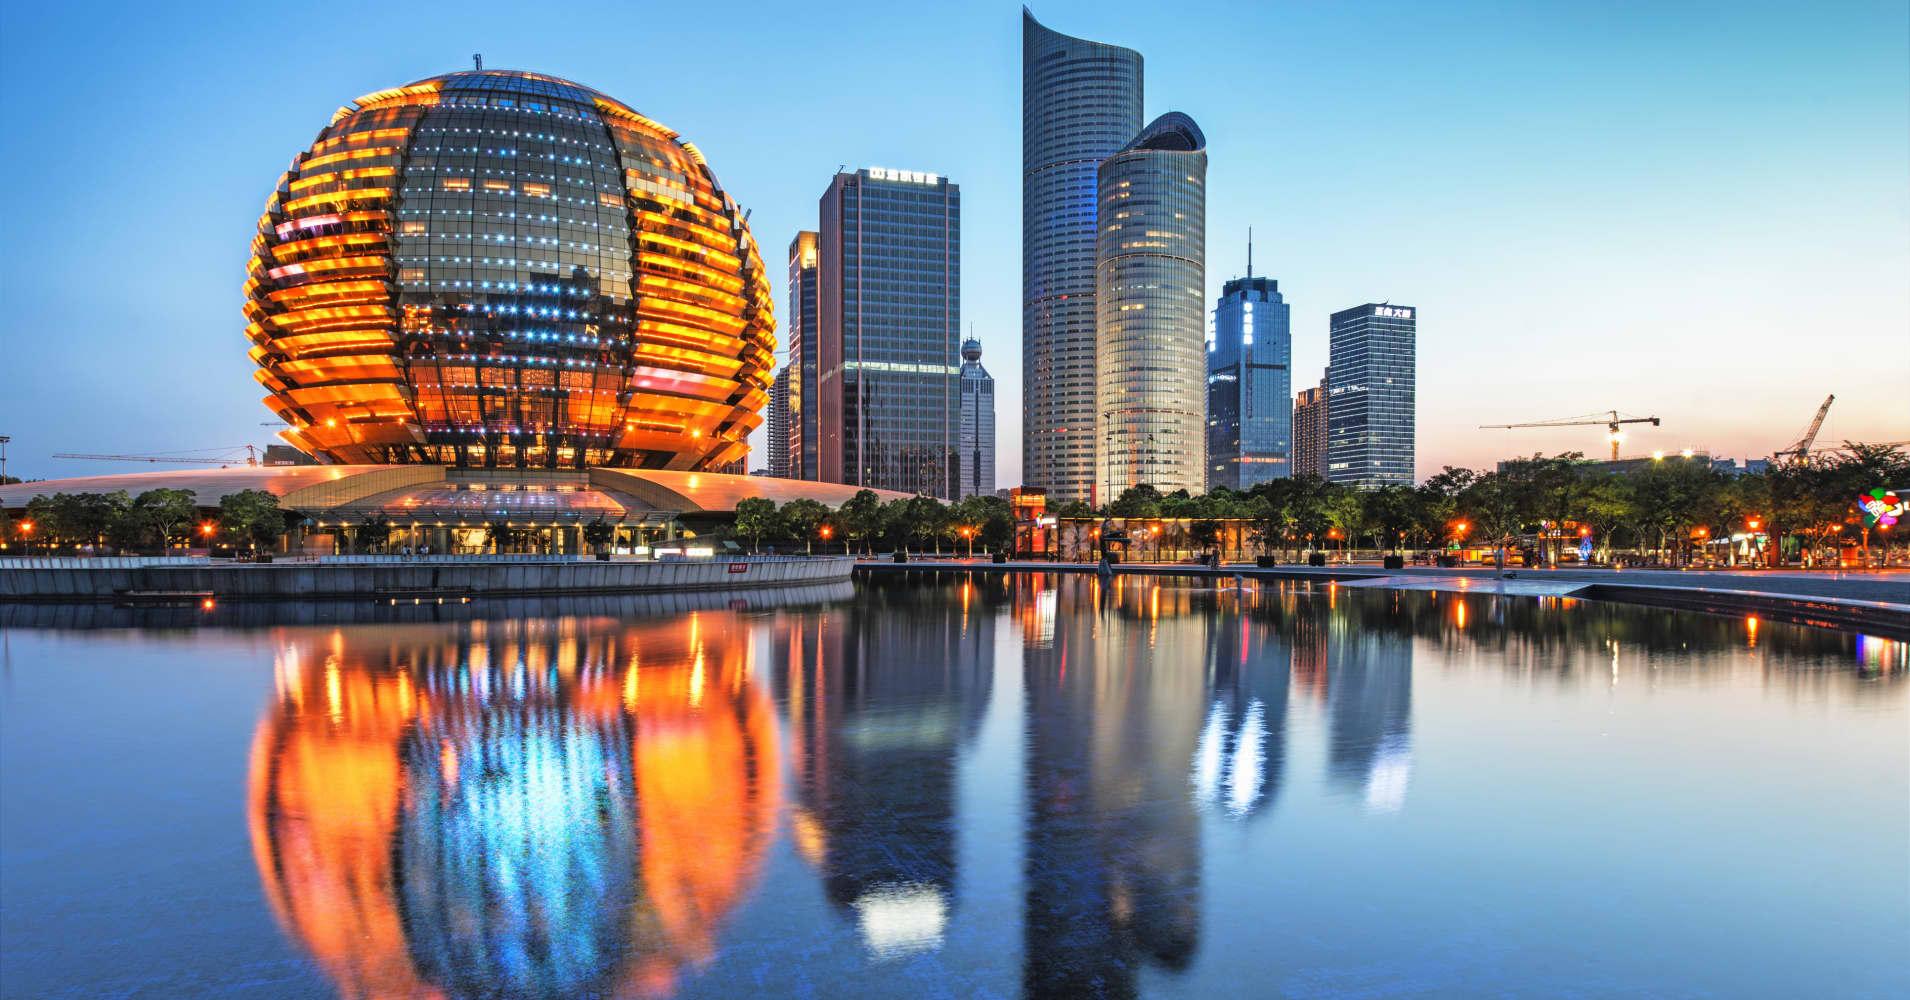 Top 10 Fastest Growing Cities: Hangzhou